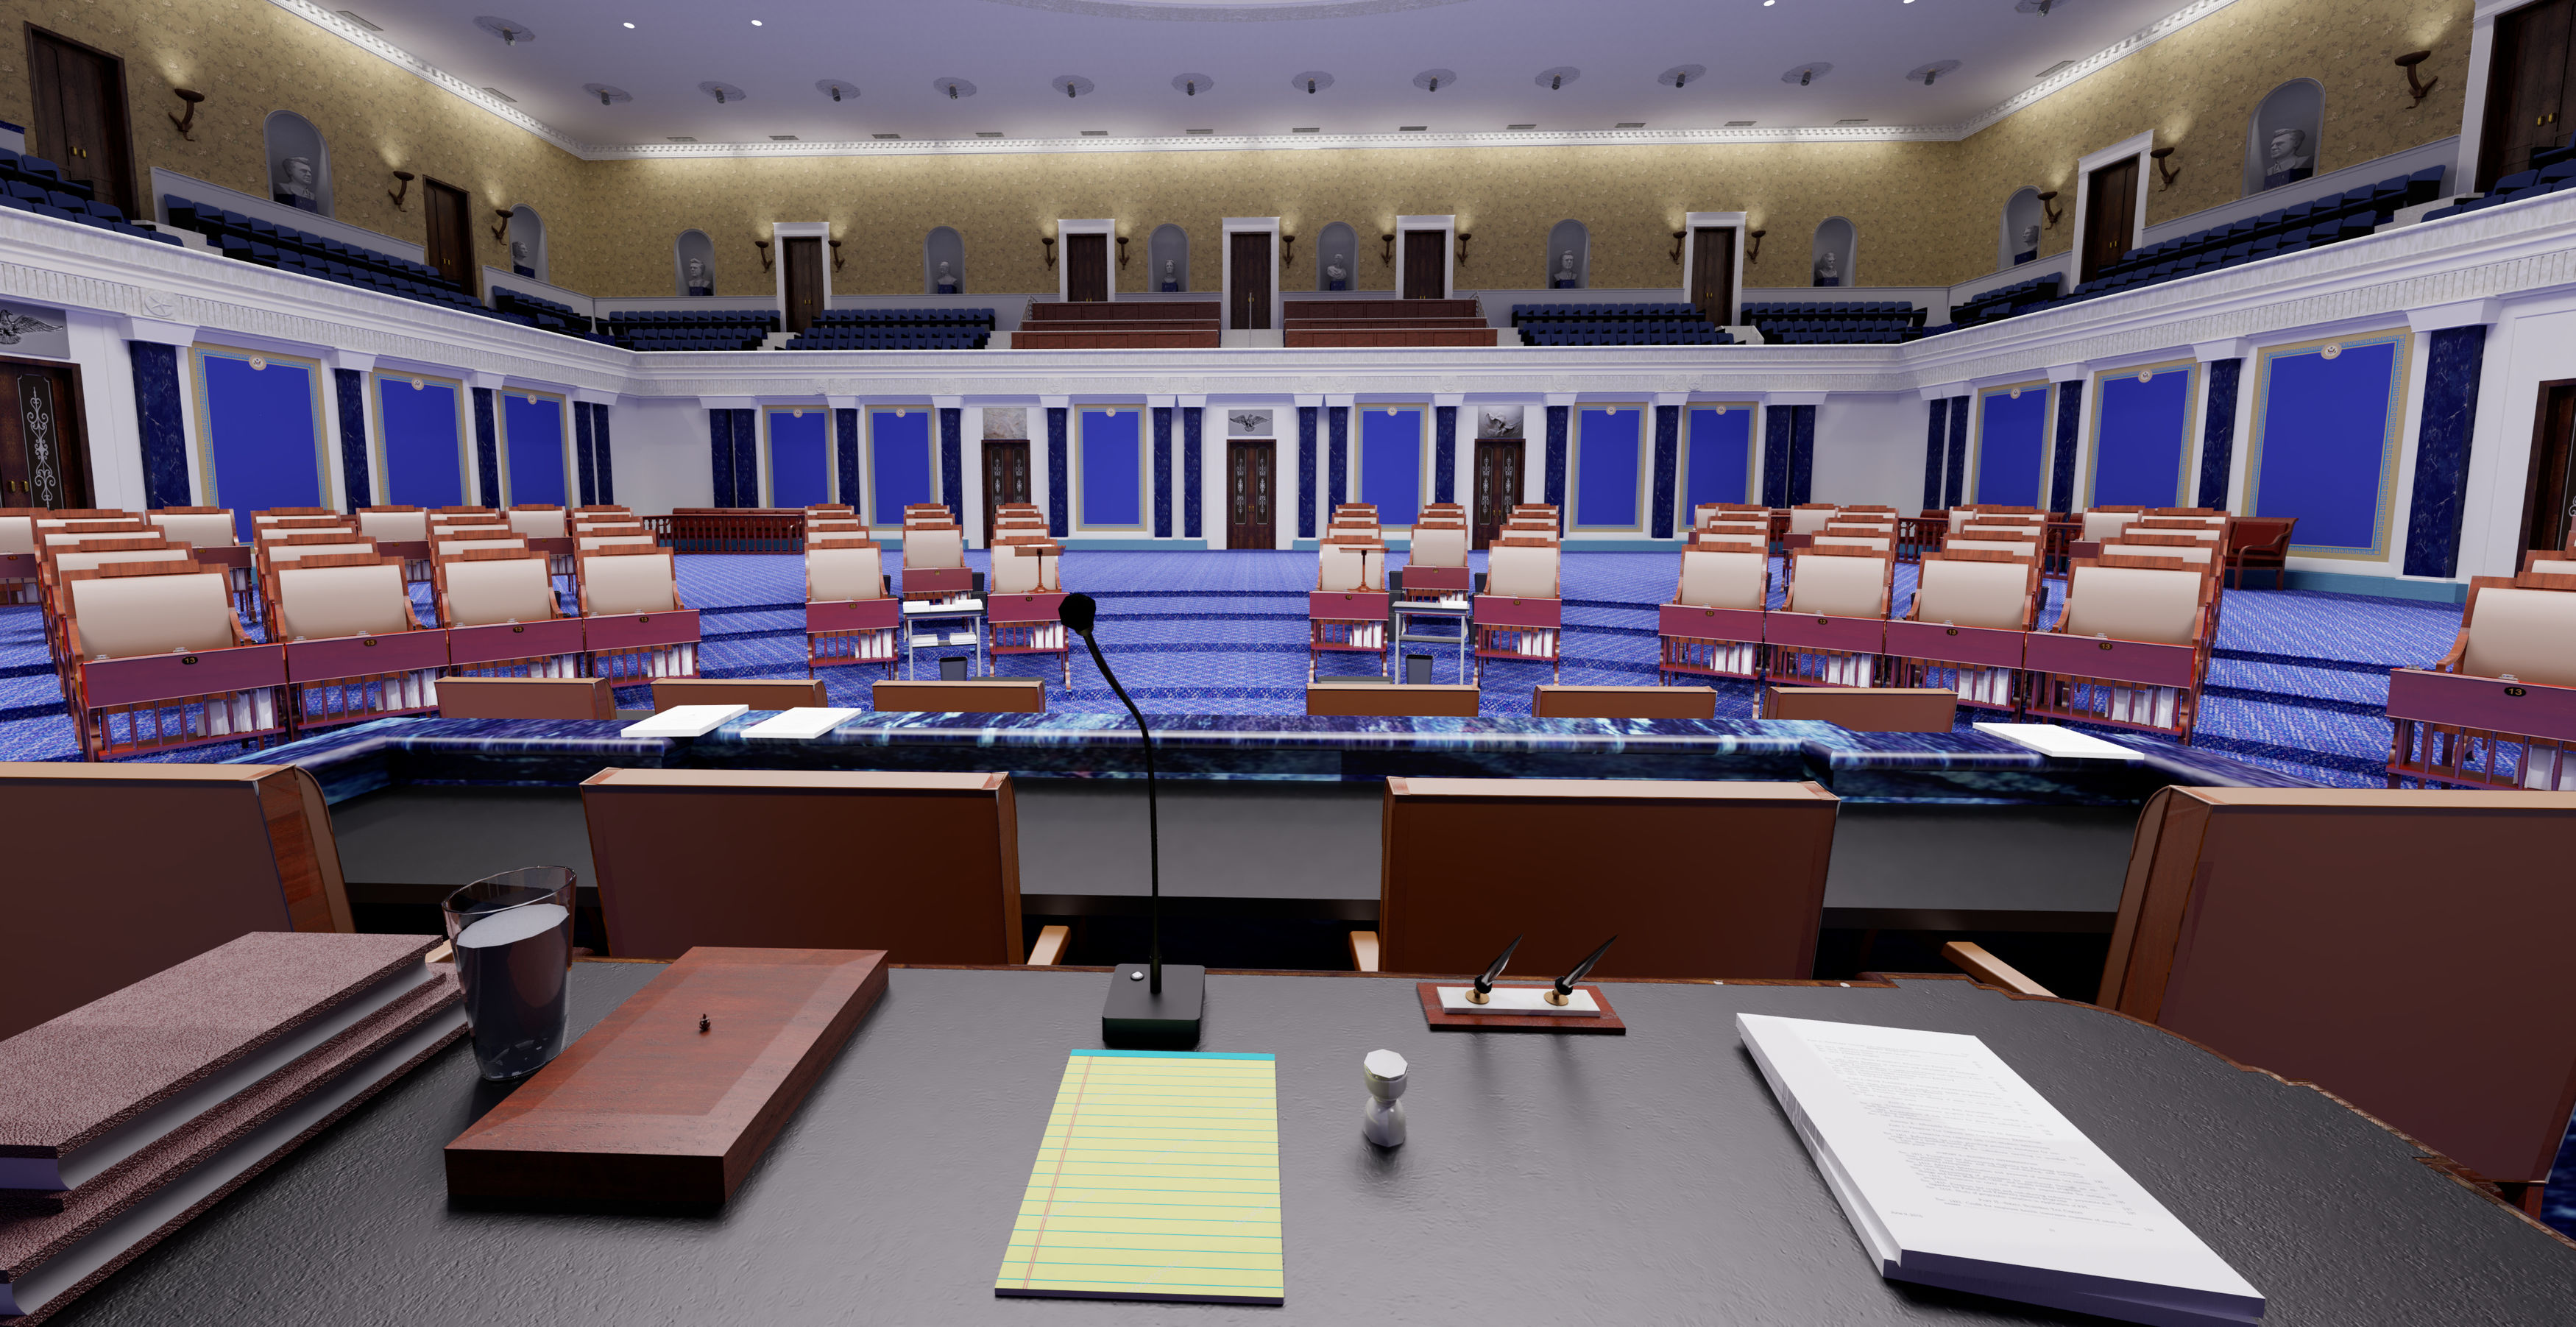 Senate-chamber-tloker-final-rvt-2020-may-07-10-47-33pm-000-vicepresidents-view-jpg-3500-3500